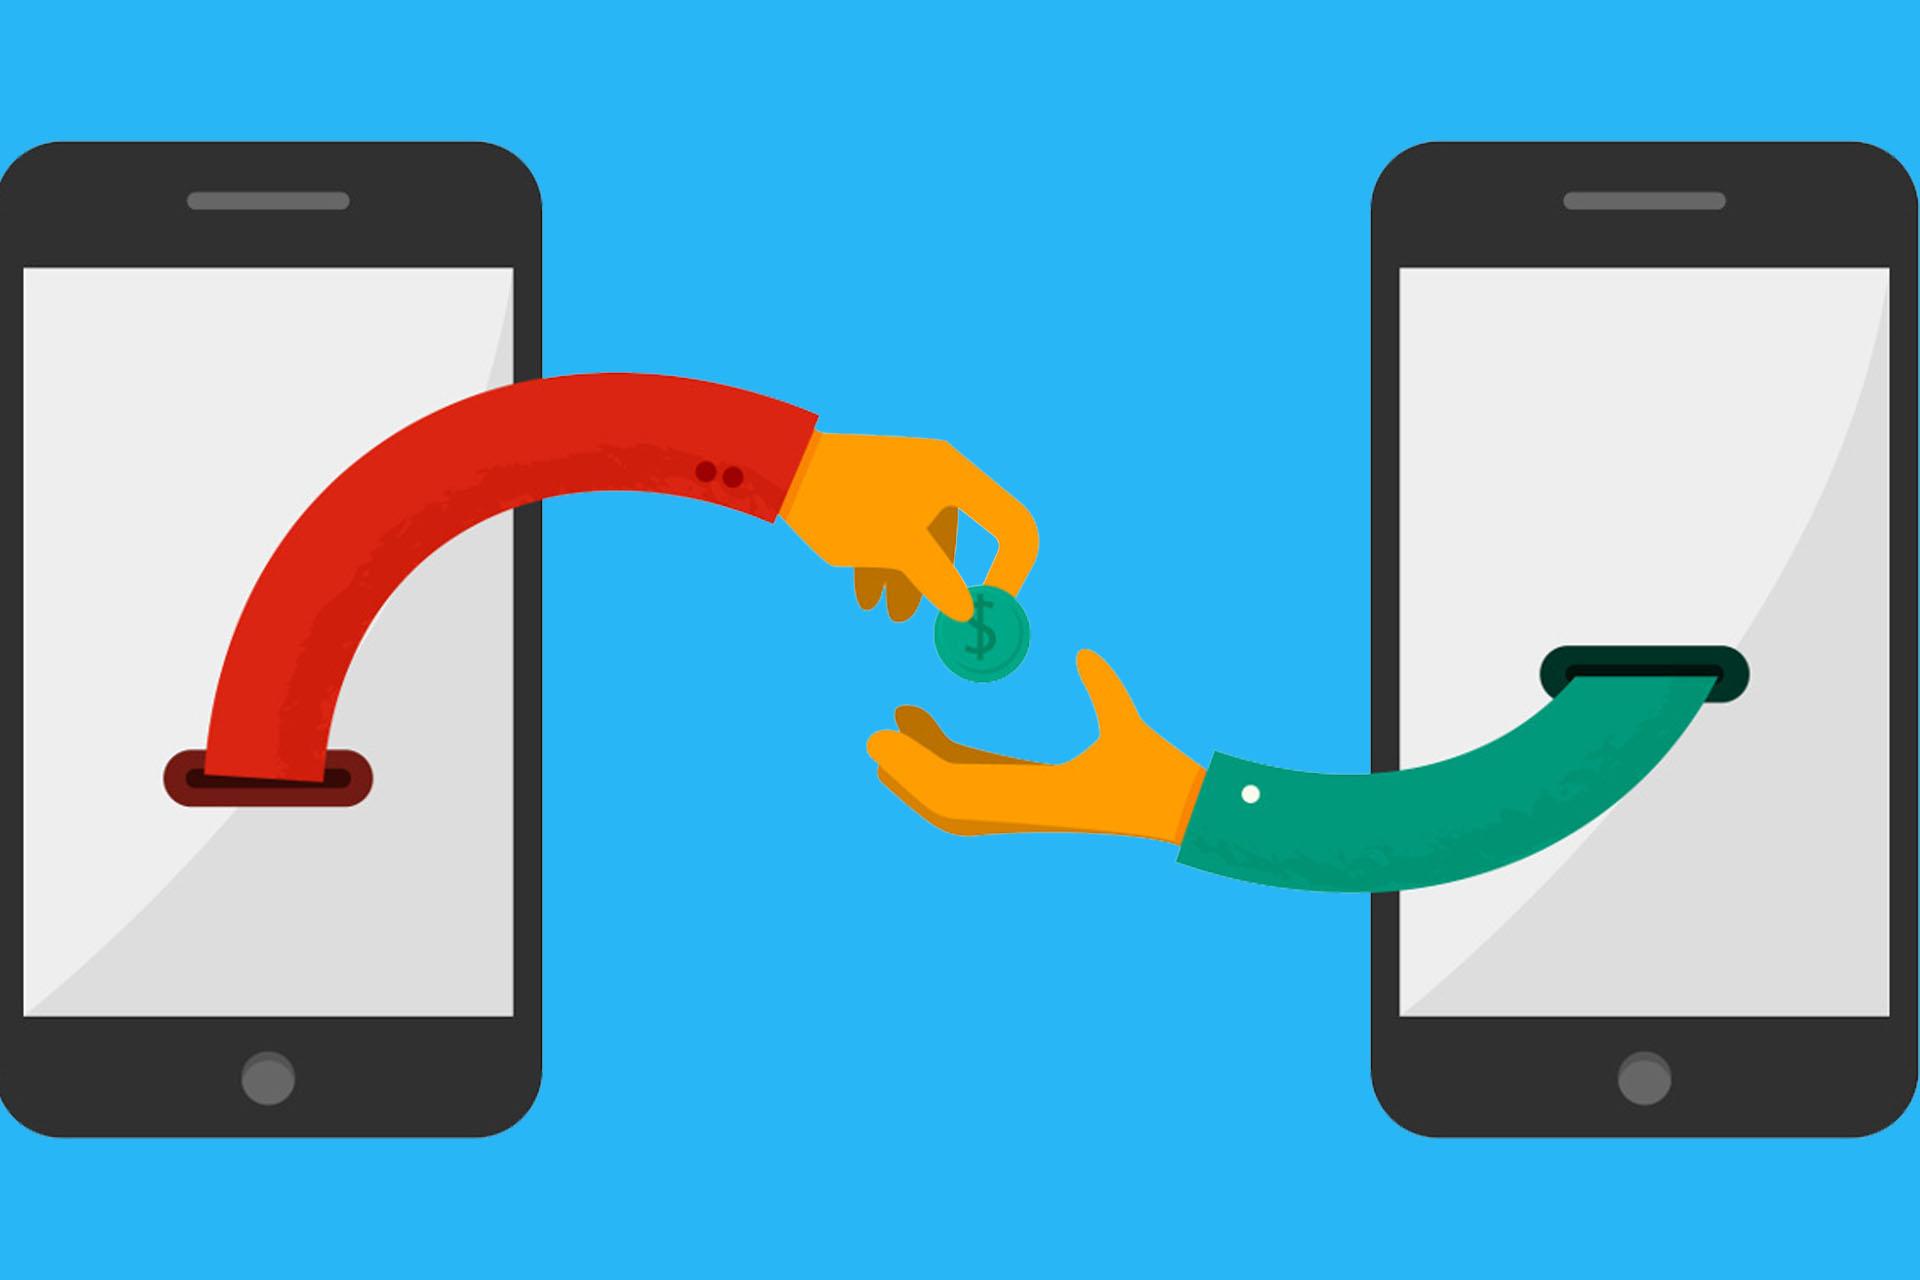 Mobile redefini la decisi n de compra del consumidor for Compra online mobili